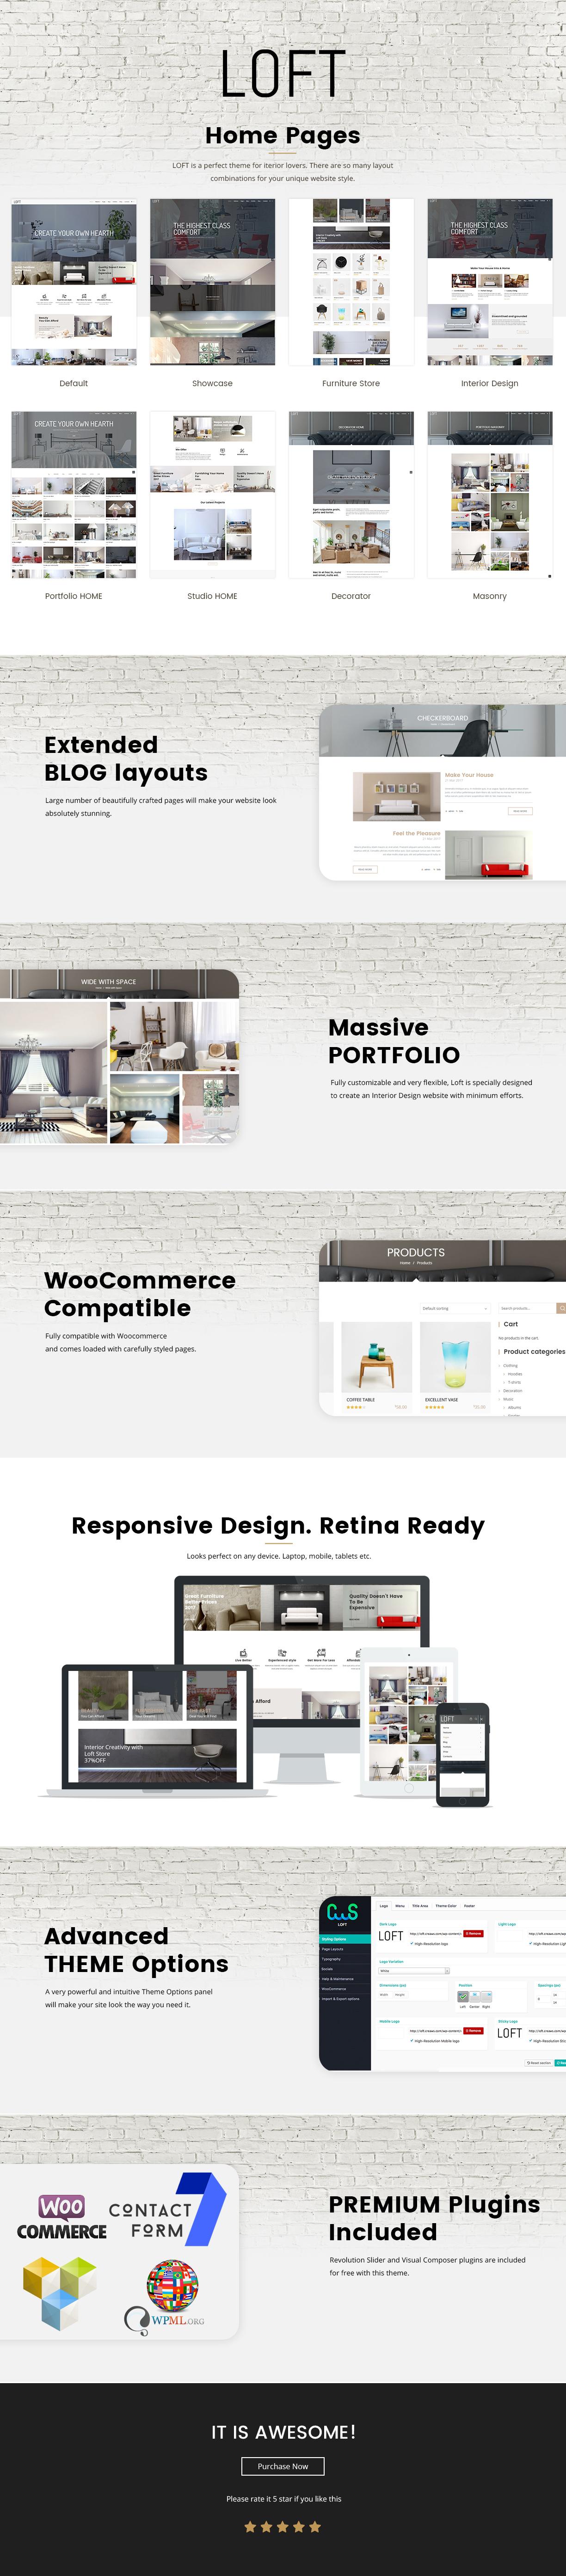 loft2 - Loft - Interior Design WordPress Theme